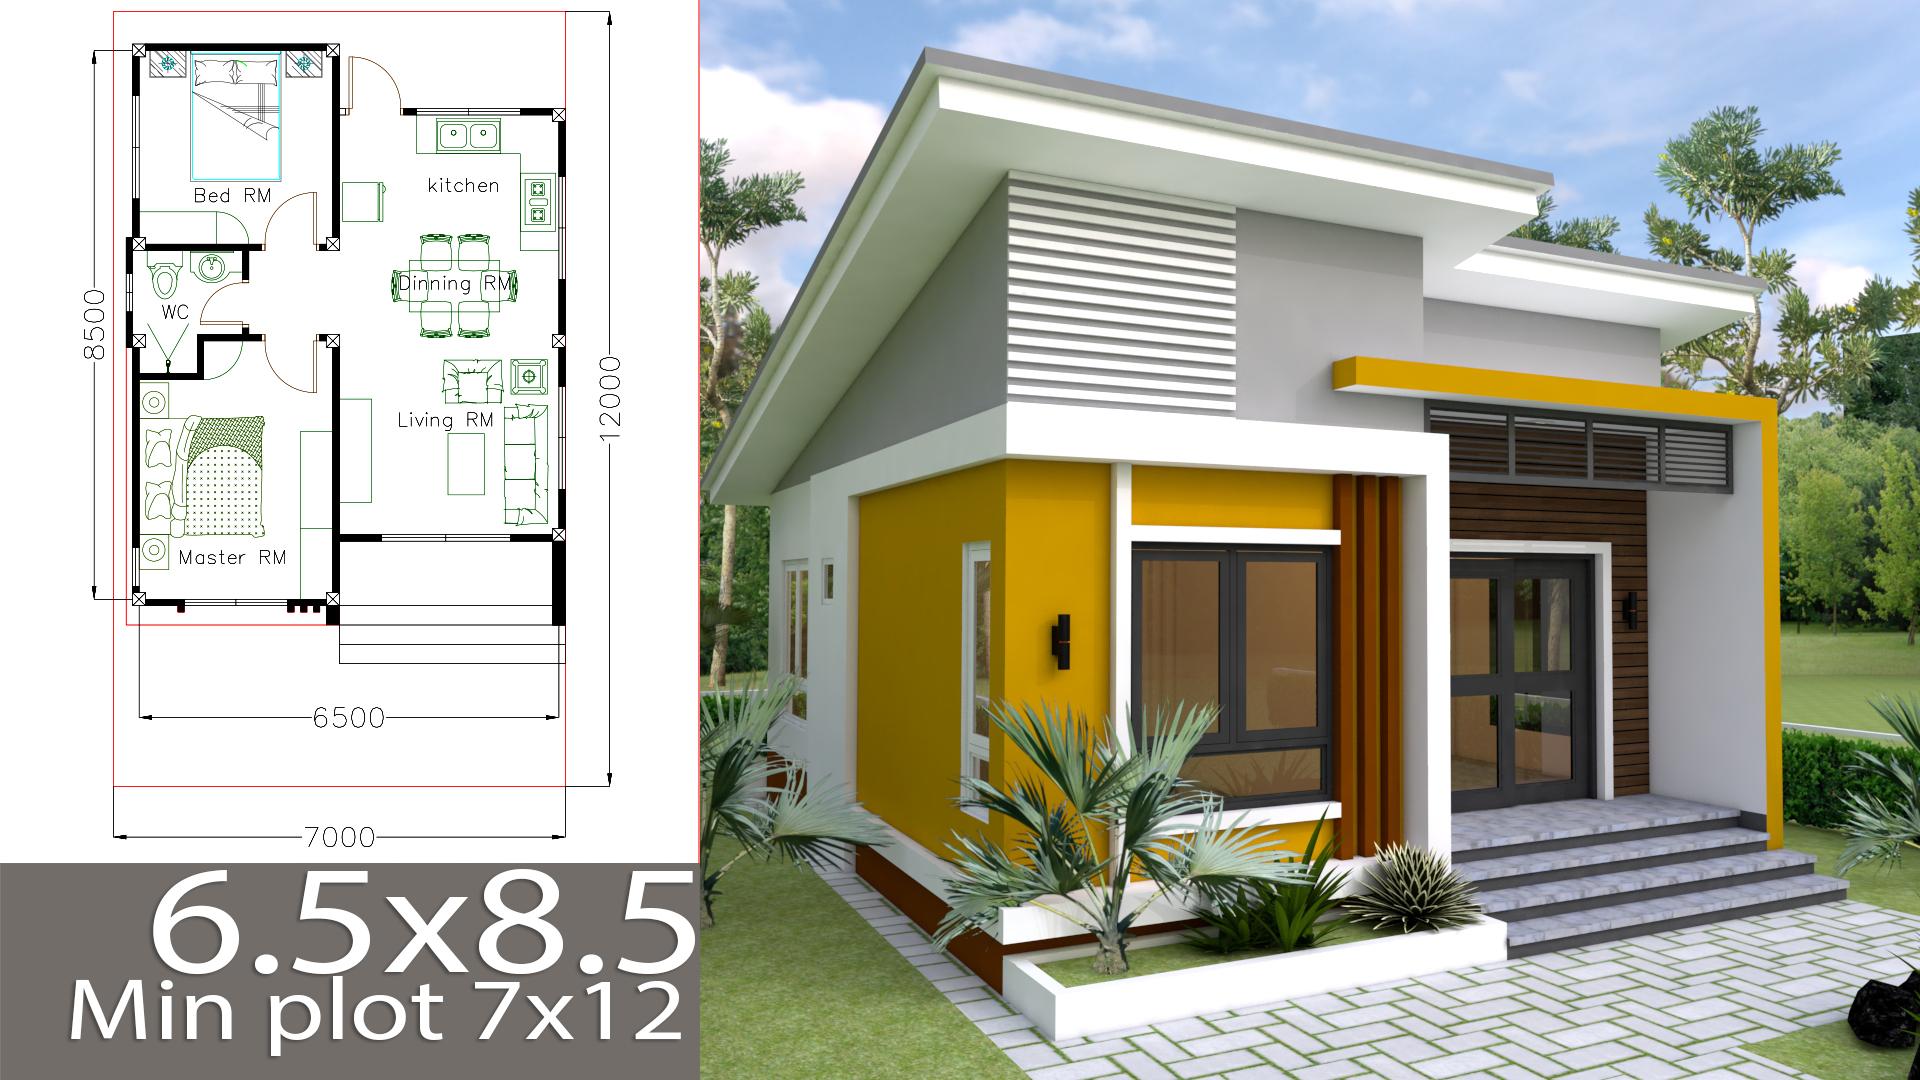 Small Home design Plan 6.5x8.5m with 2 Bedrooms - SamPhoas Plan